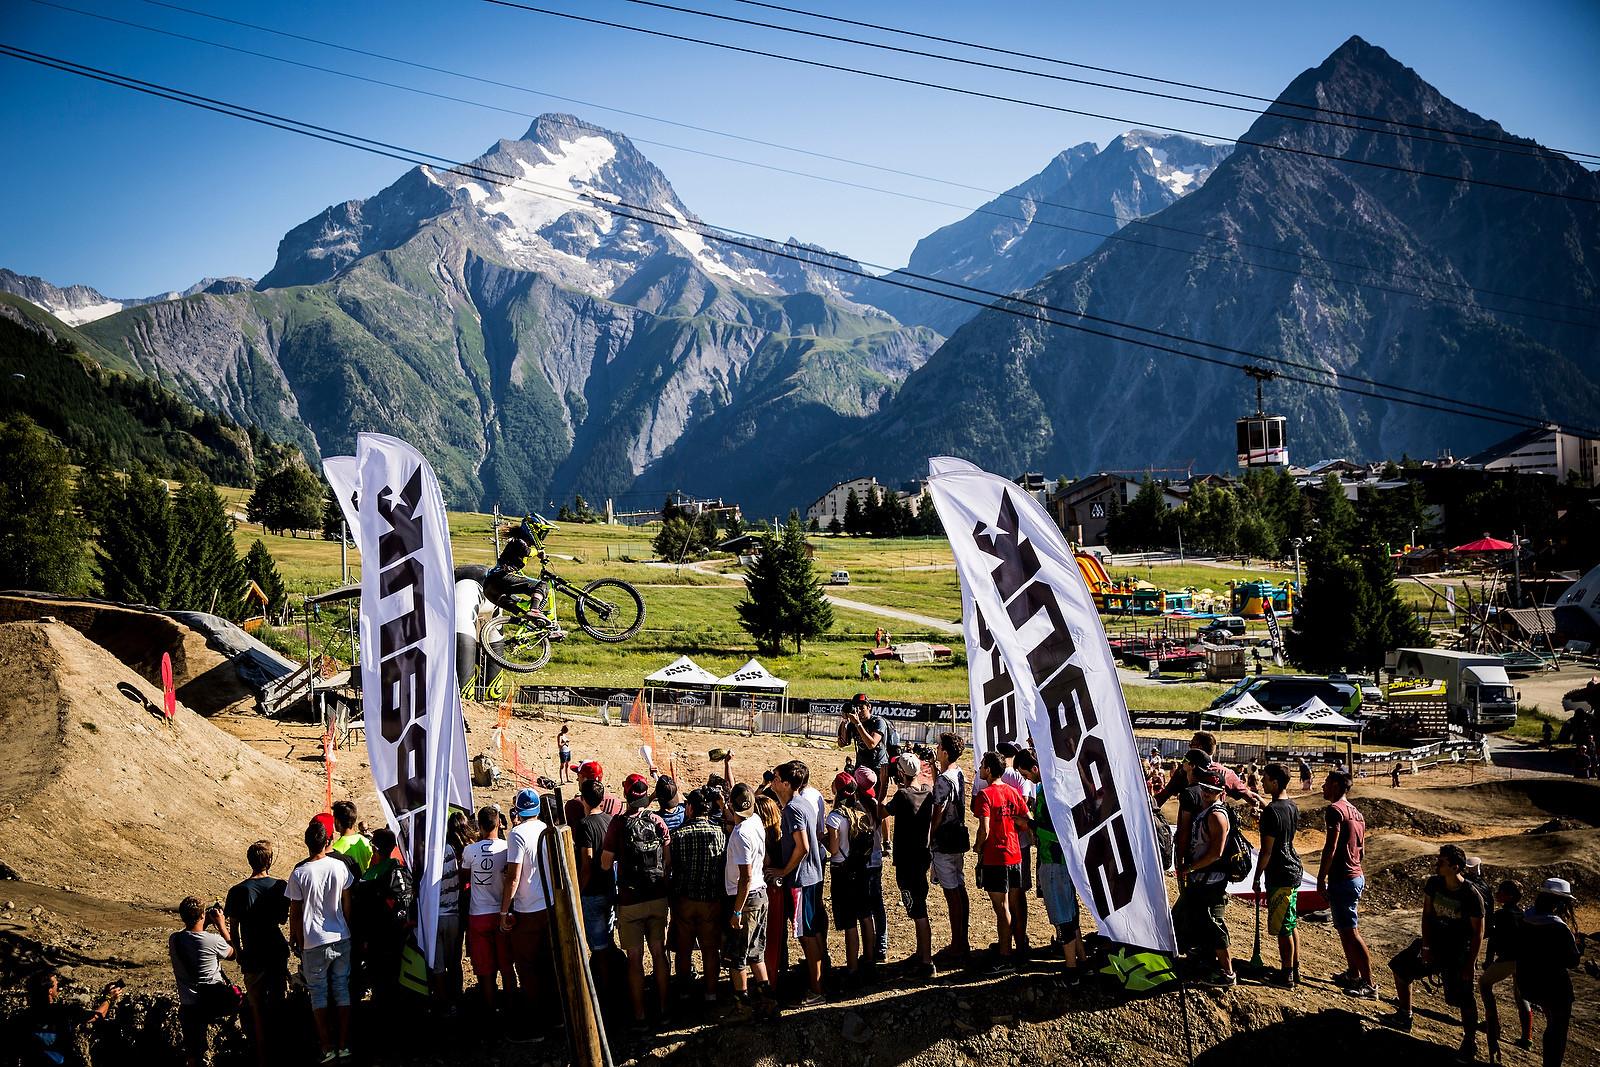 Casey Brown, Whip Off European Champs, Crankworx L2A - Whip Off European Champs, Crankworx L2A - Mountain Biking Pictures - Vital MTB